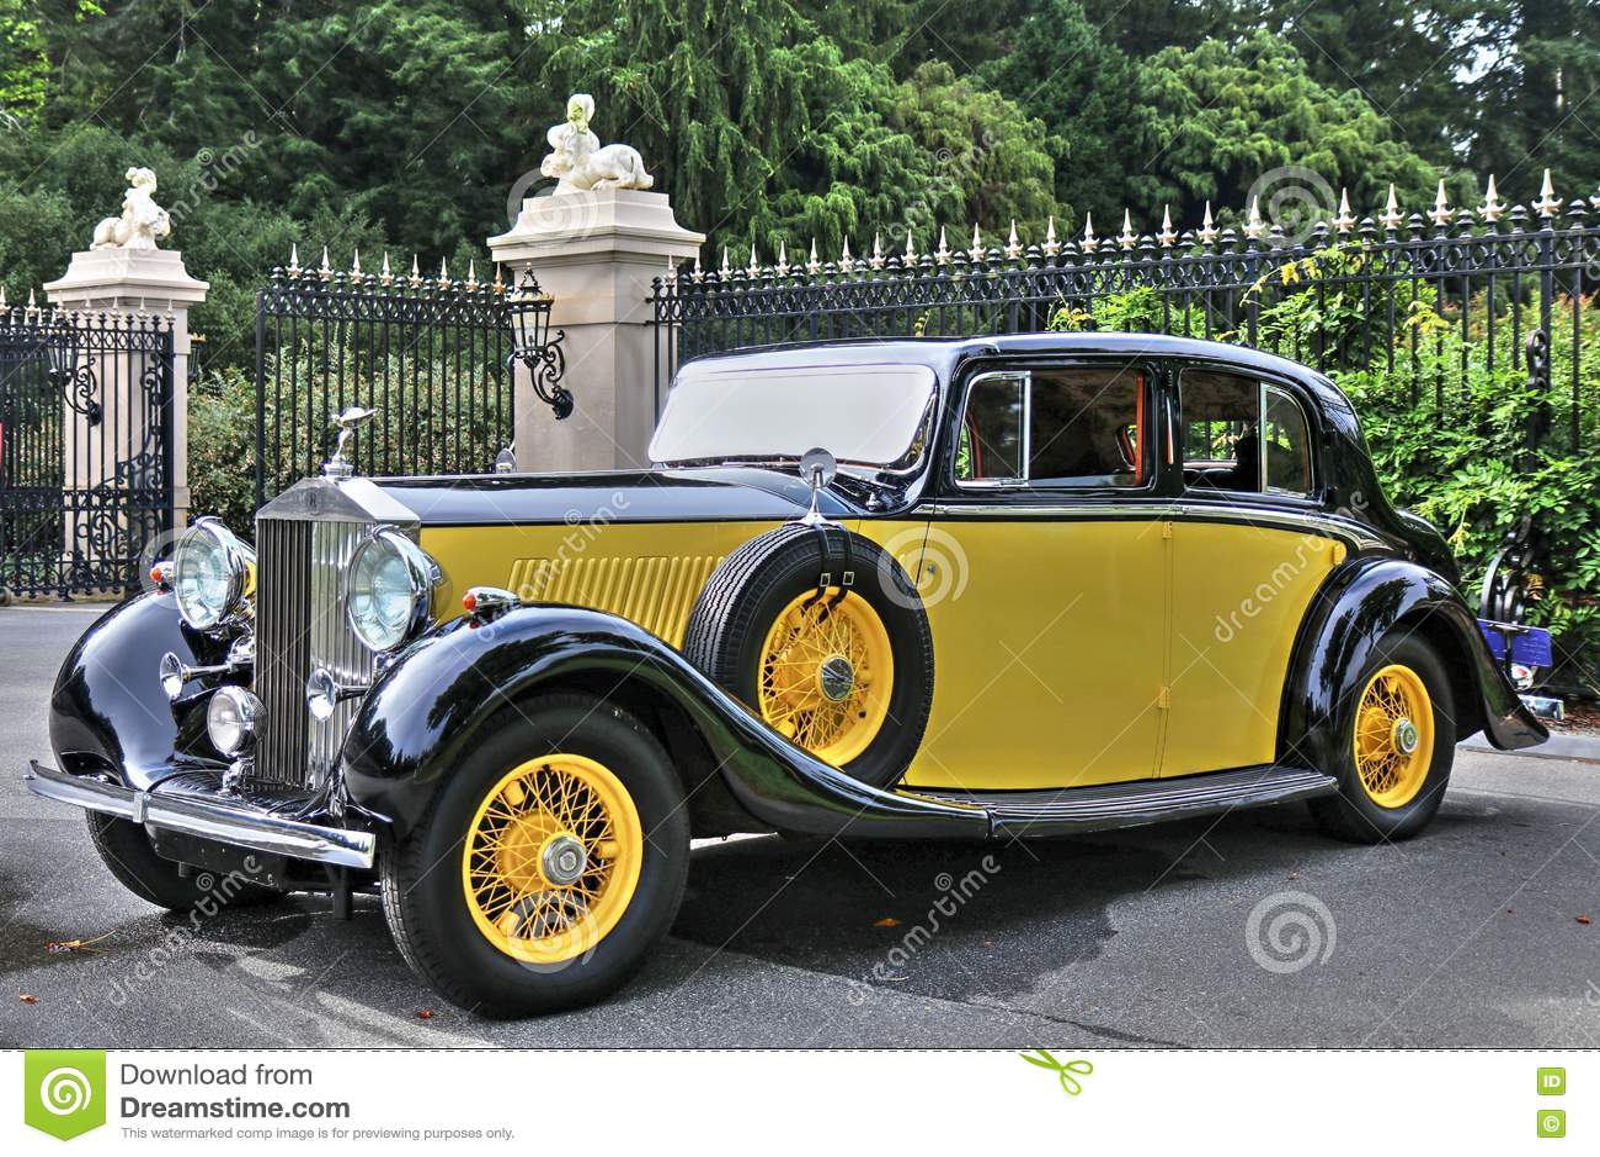 1934 rolls royce phantom ii in yellow editorial photography image 75640047. Black Bedroom Furniture Sets. Home Design Ideas